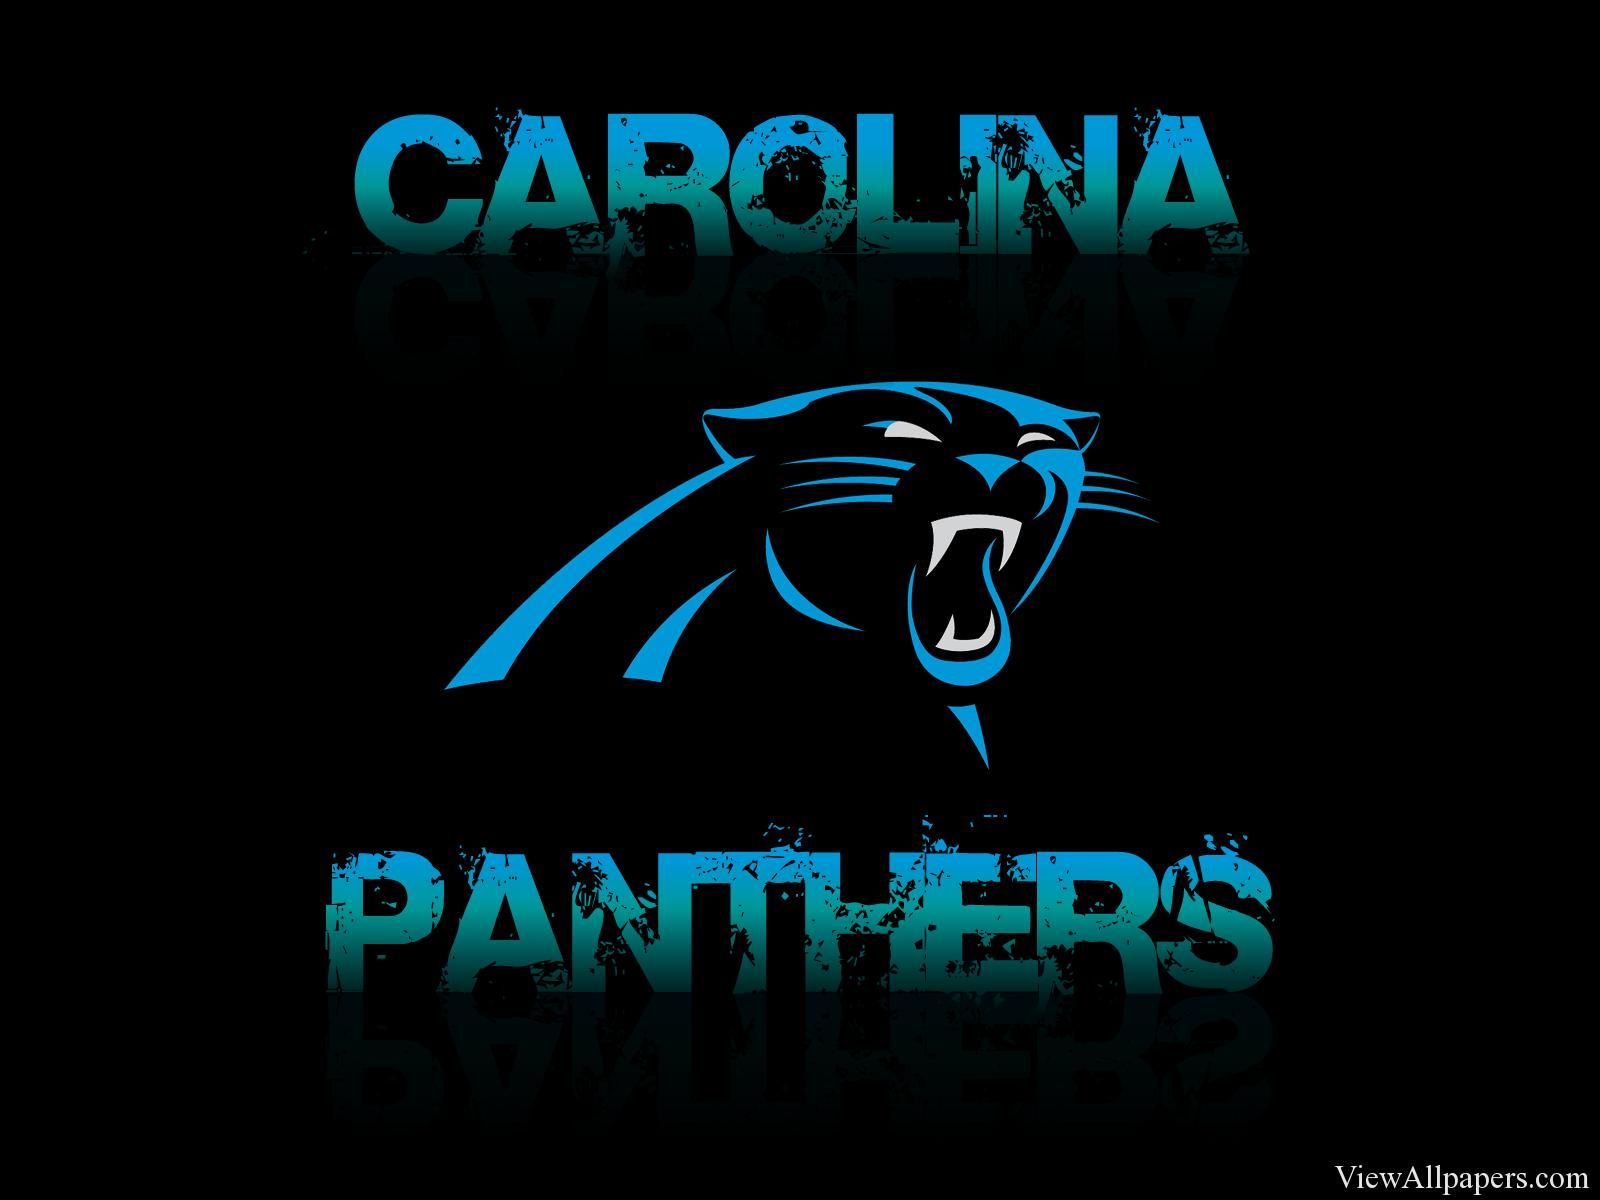 Carolina Panthers Logo HD Resolution download Carolina Panthers 1600x1200